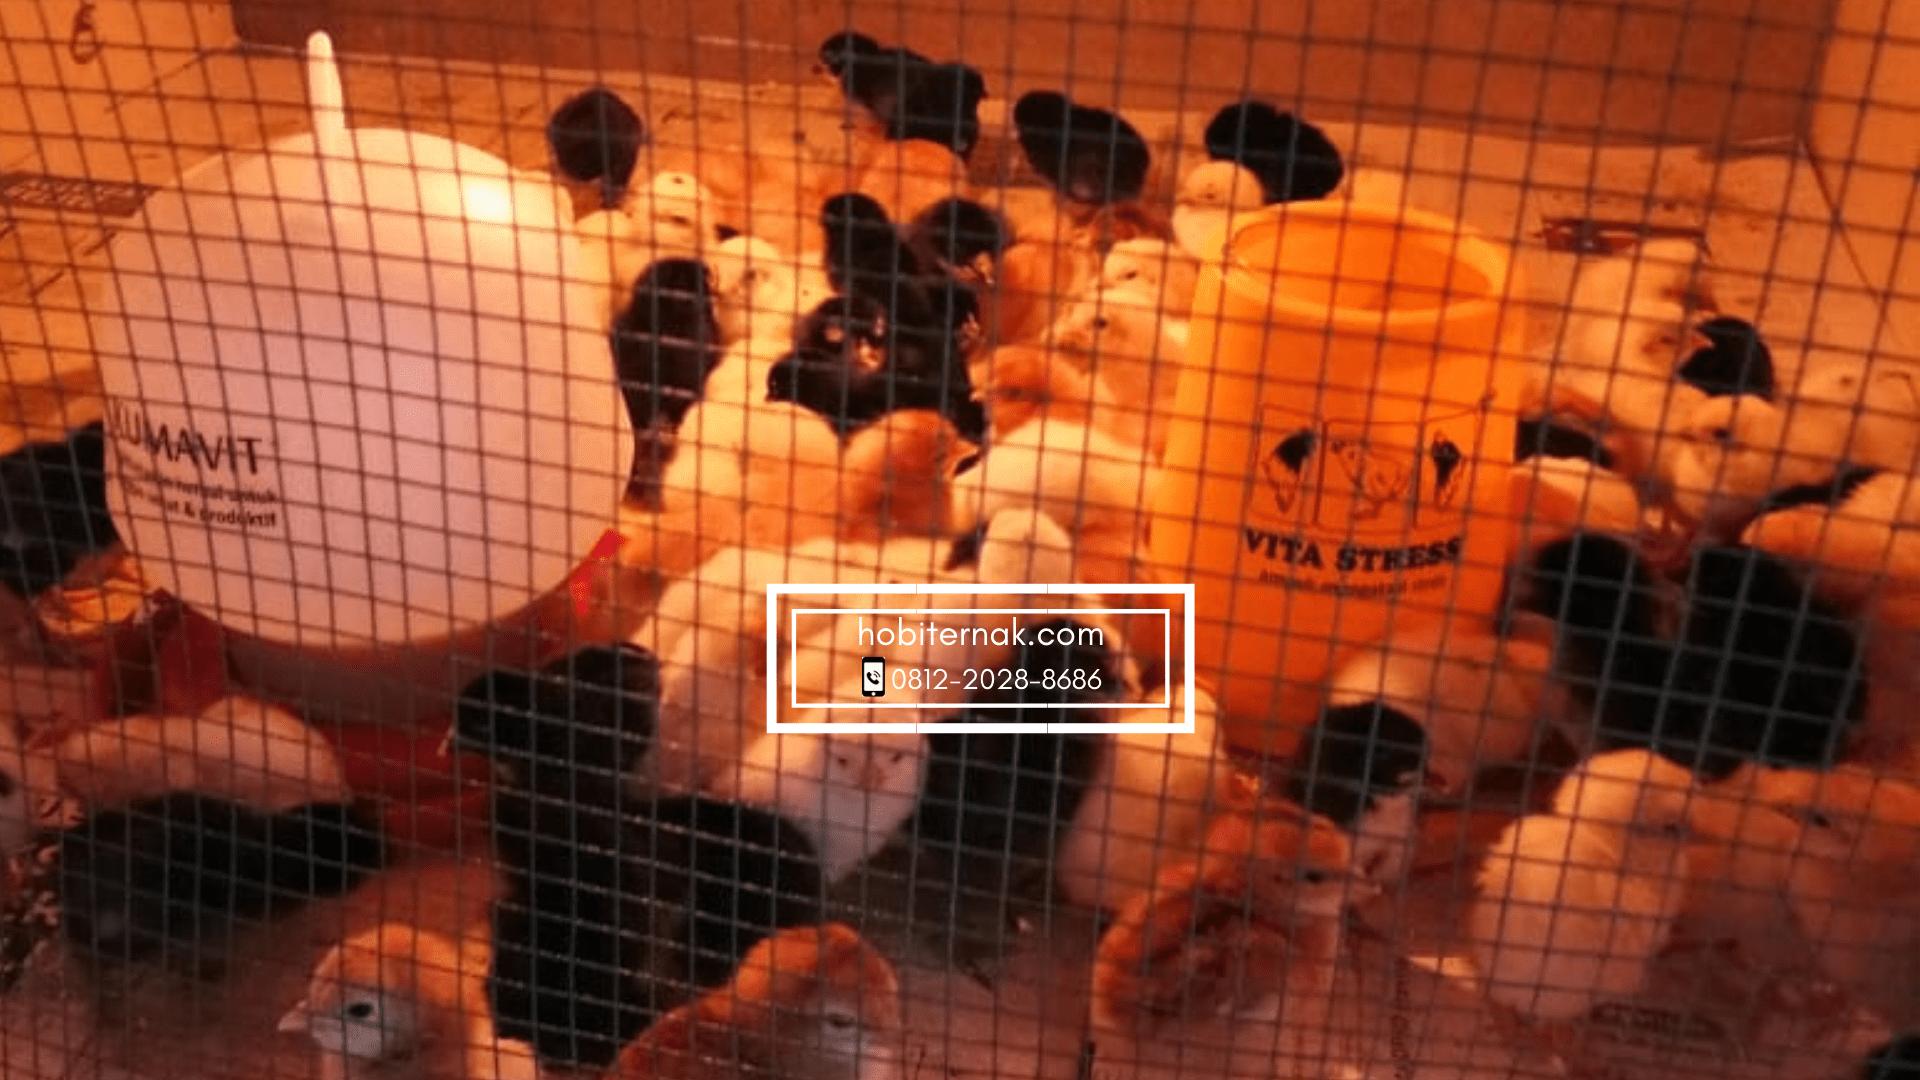 DOC Ayam Kampung Super saat di dalam kandang diberikan lampu penerangan agar DOC selalu dalam keadaan hangat | Image 2